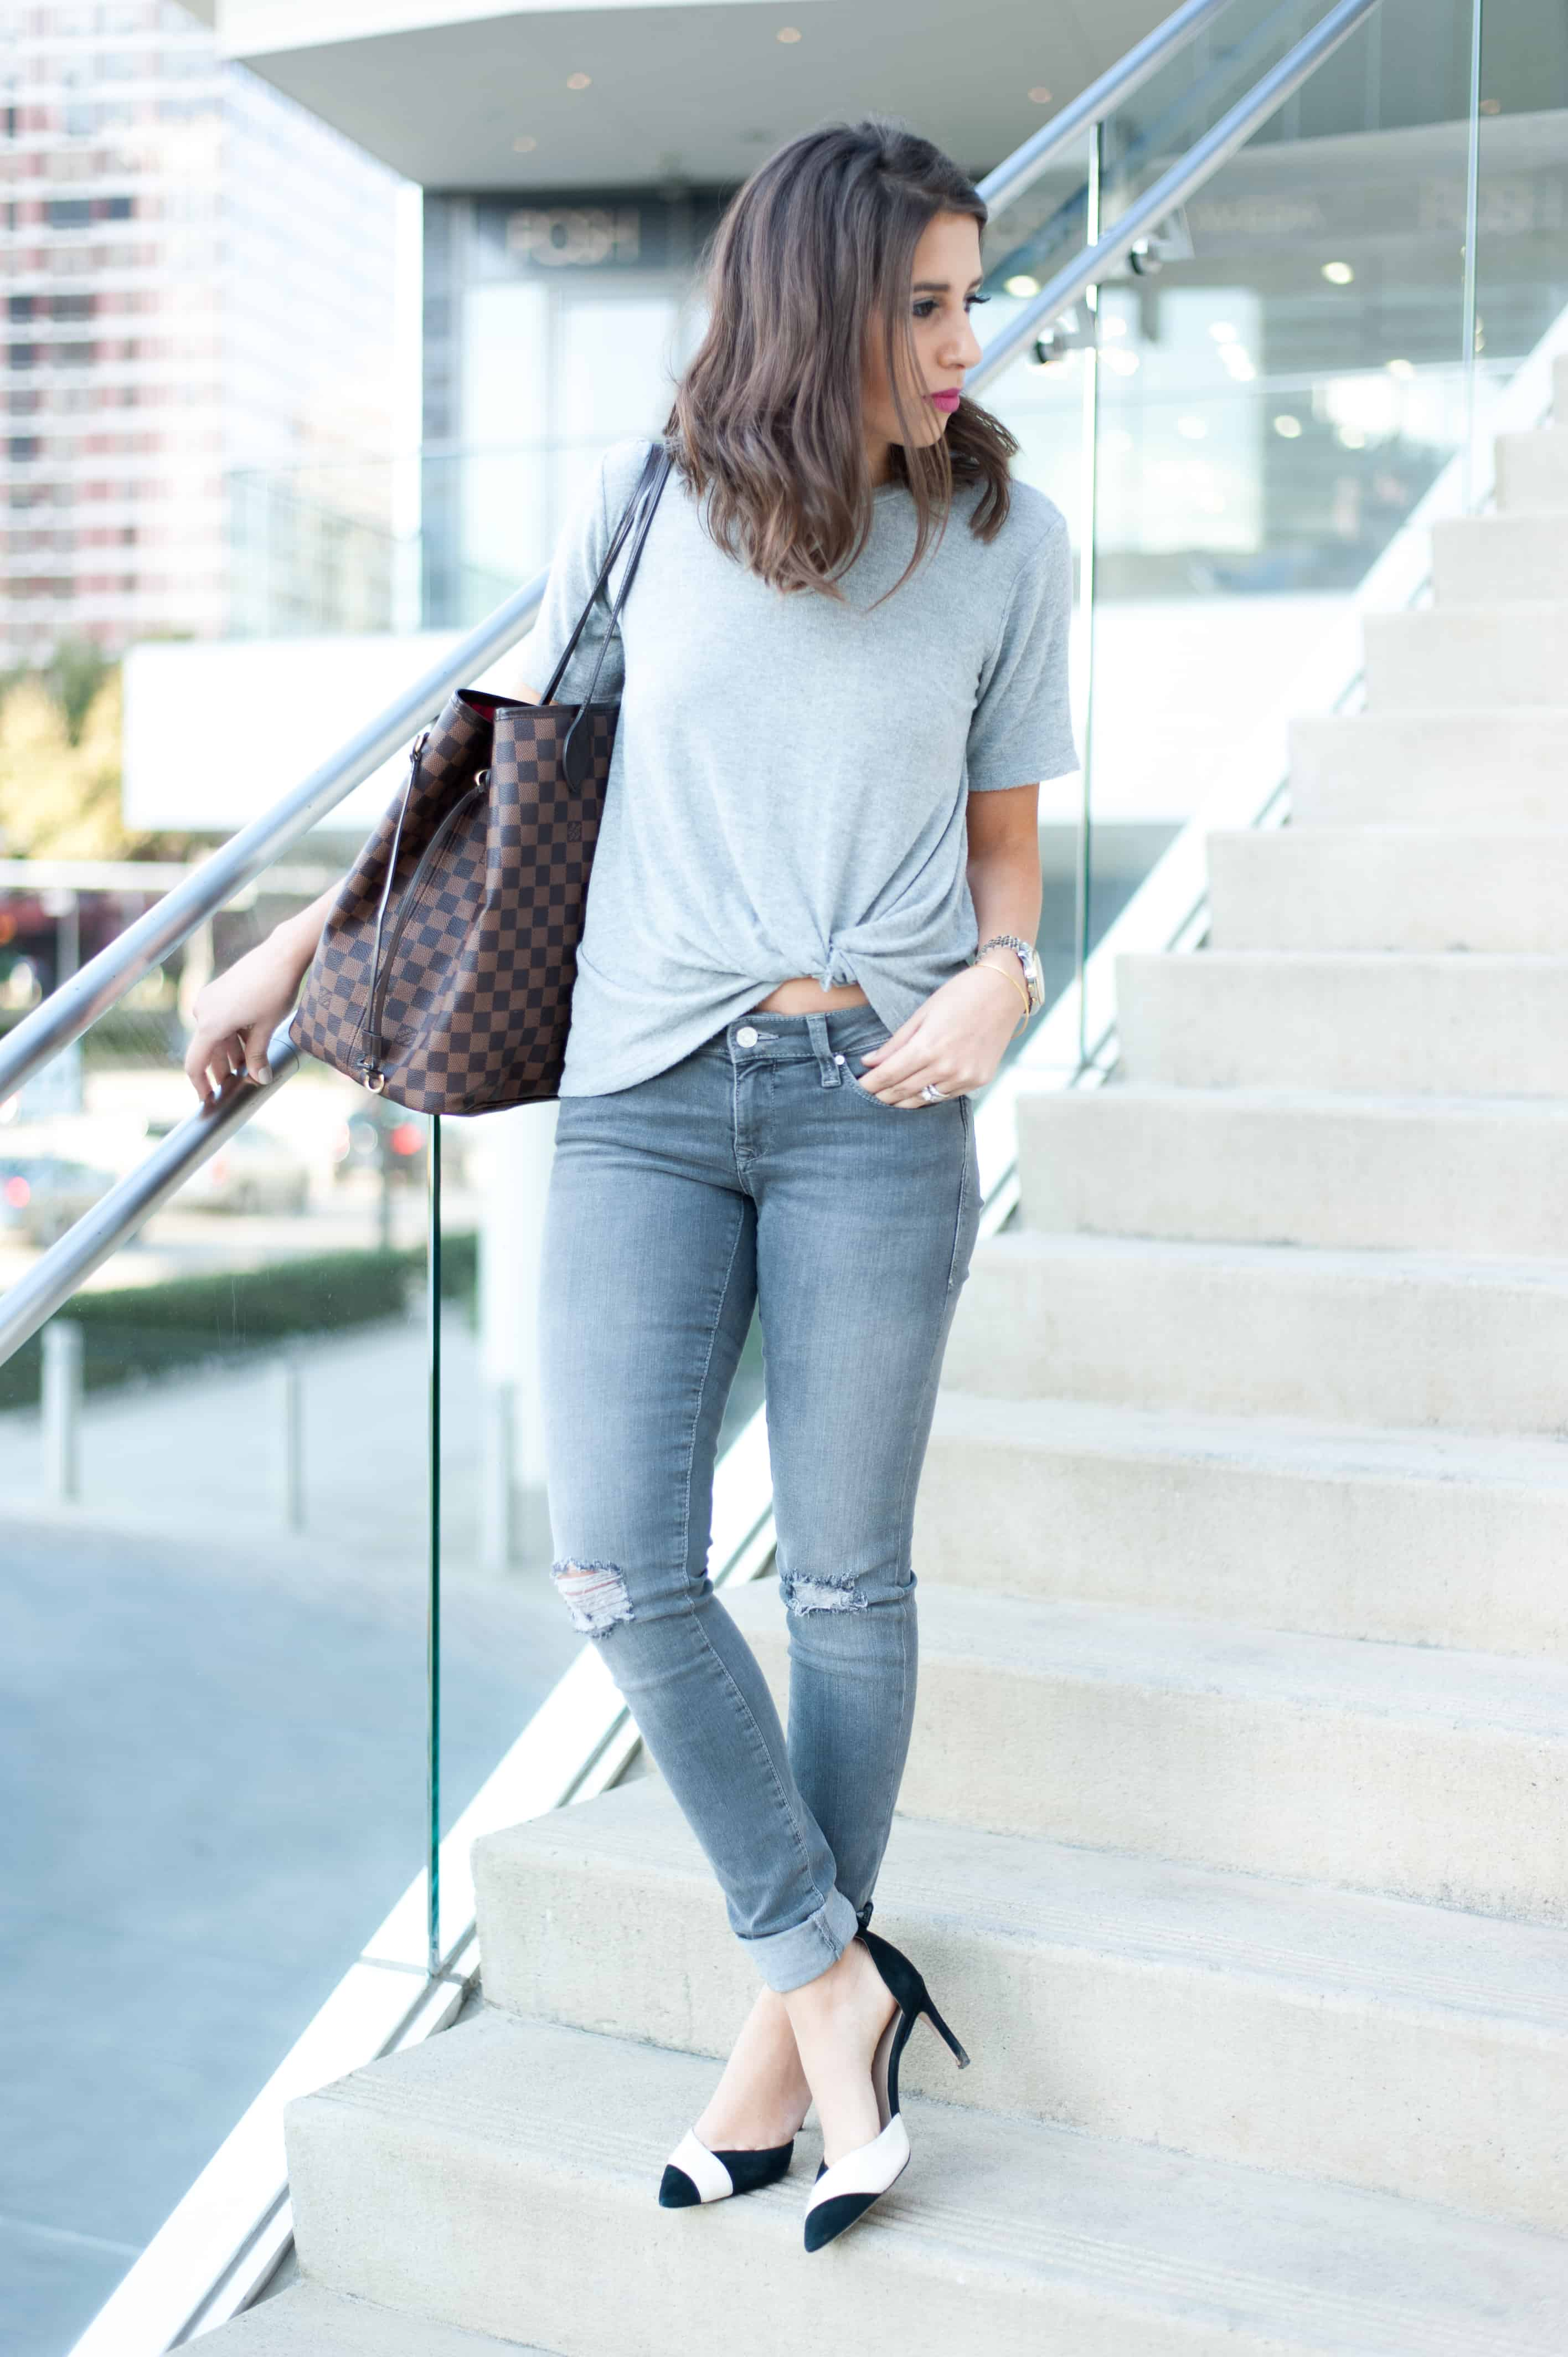 Mavi Jeans 'Serena' Distressed Stretch Skinny Jeans (Grey Ripped) June & Hudson Knot Hem Tee Monochrome